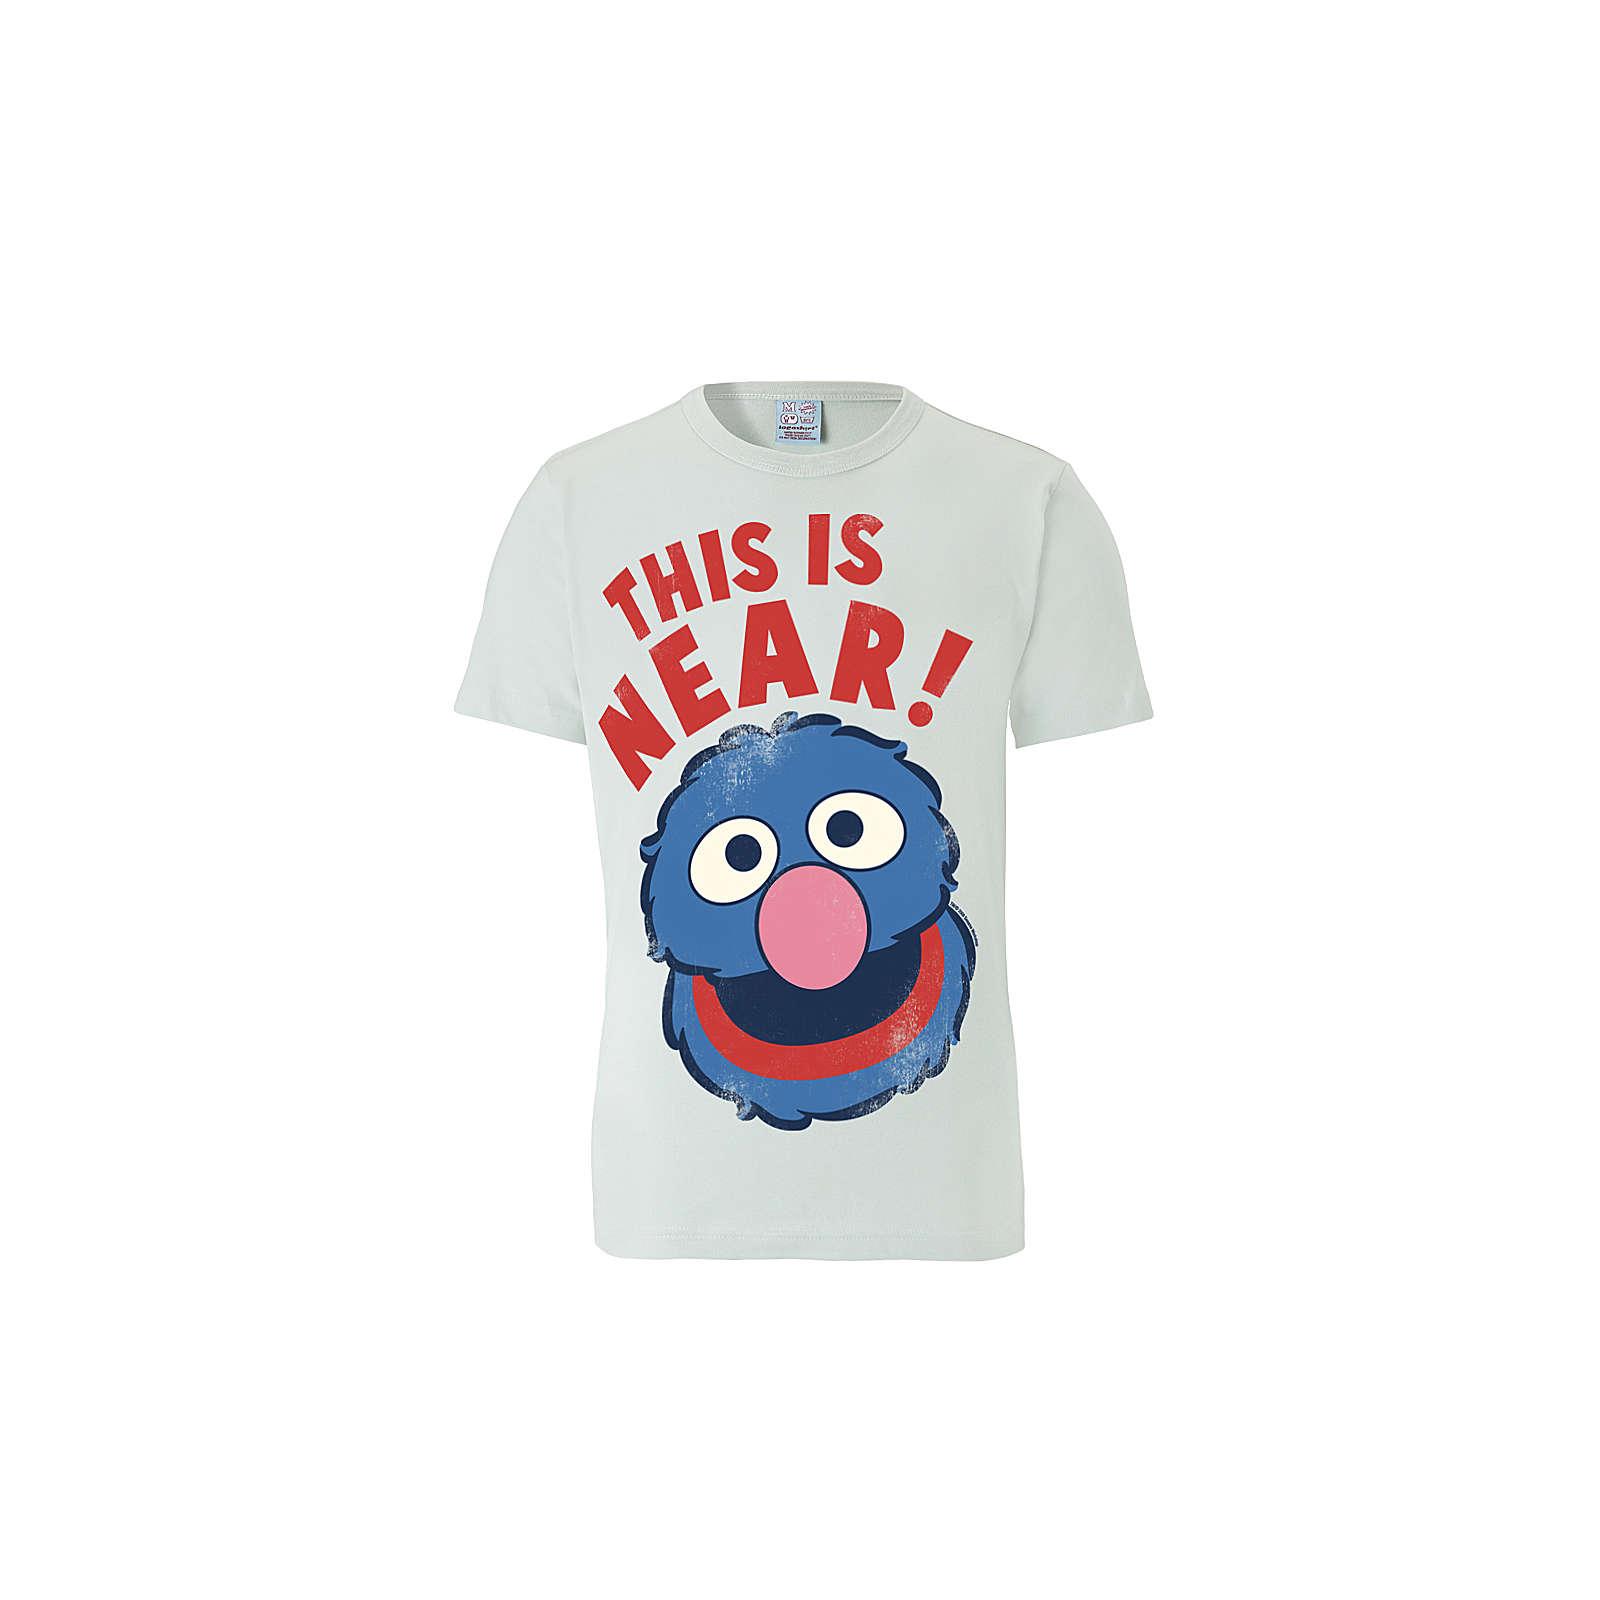 7a9f6ca1e0 Logoshirt® Logoshirt T-Shirt Grobi- Sesamstrasse - Near/Far T-Shirts